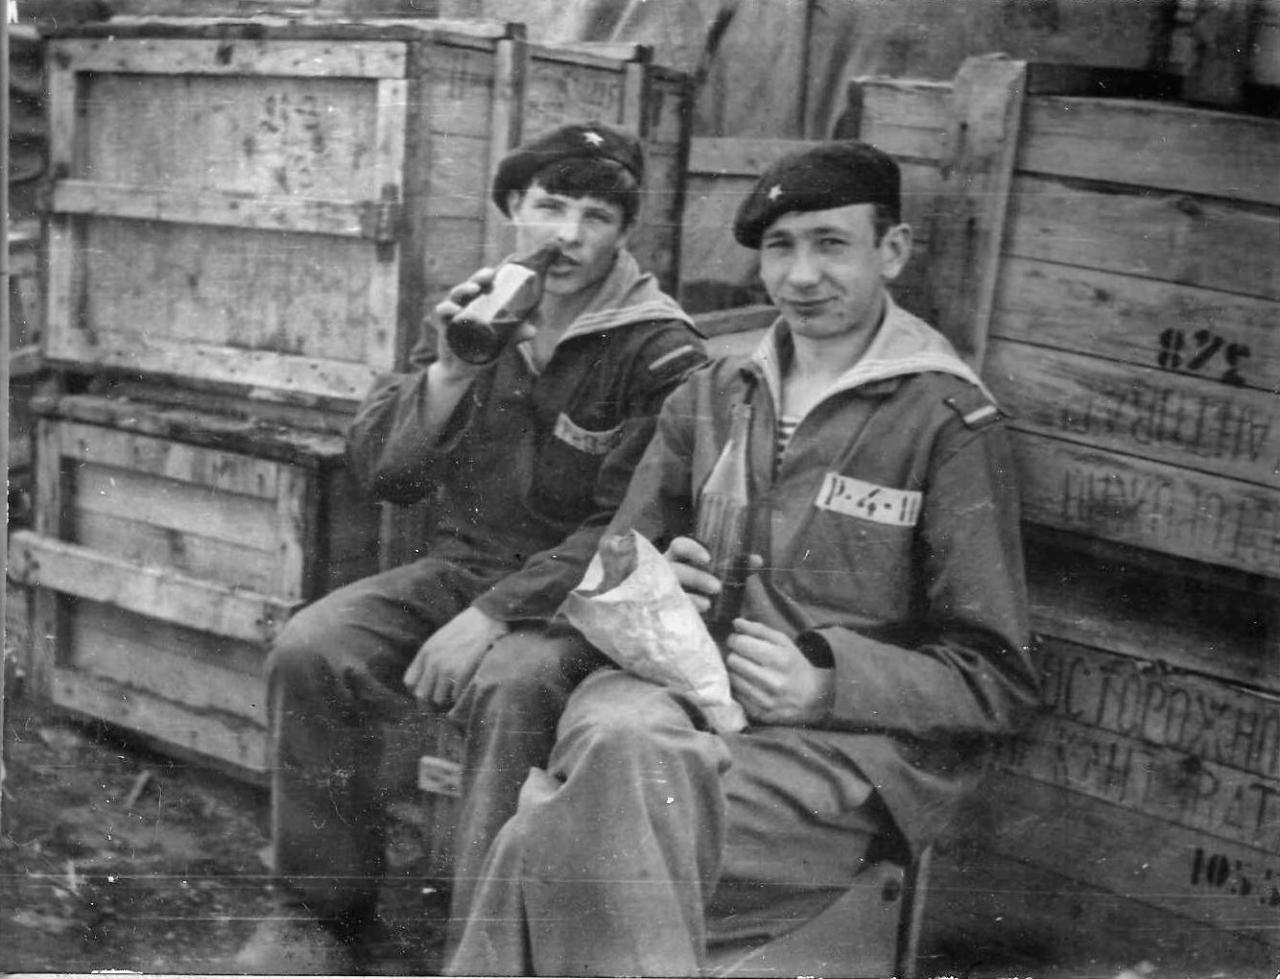 Экипаж «Магаданского комсомольца» на хоз. работах на базе флота (9-й км). 1973 год.